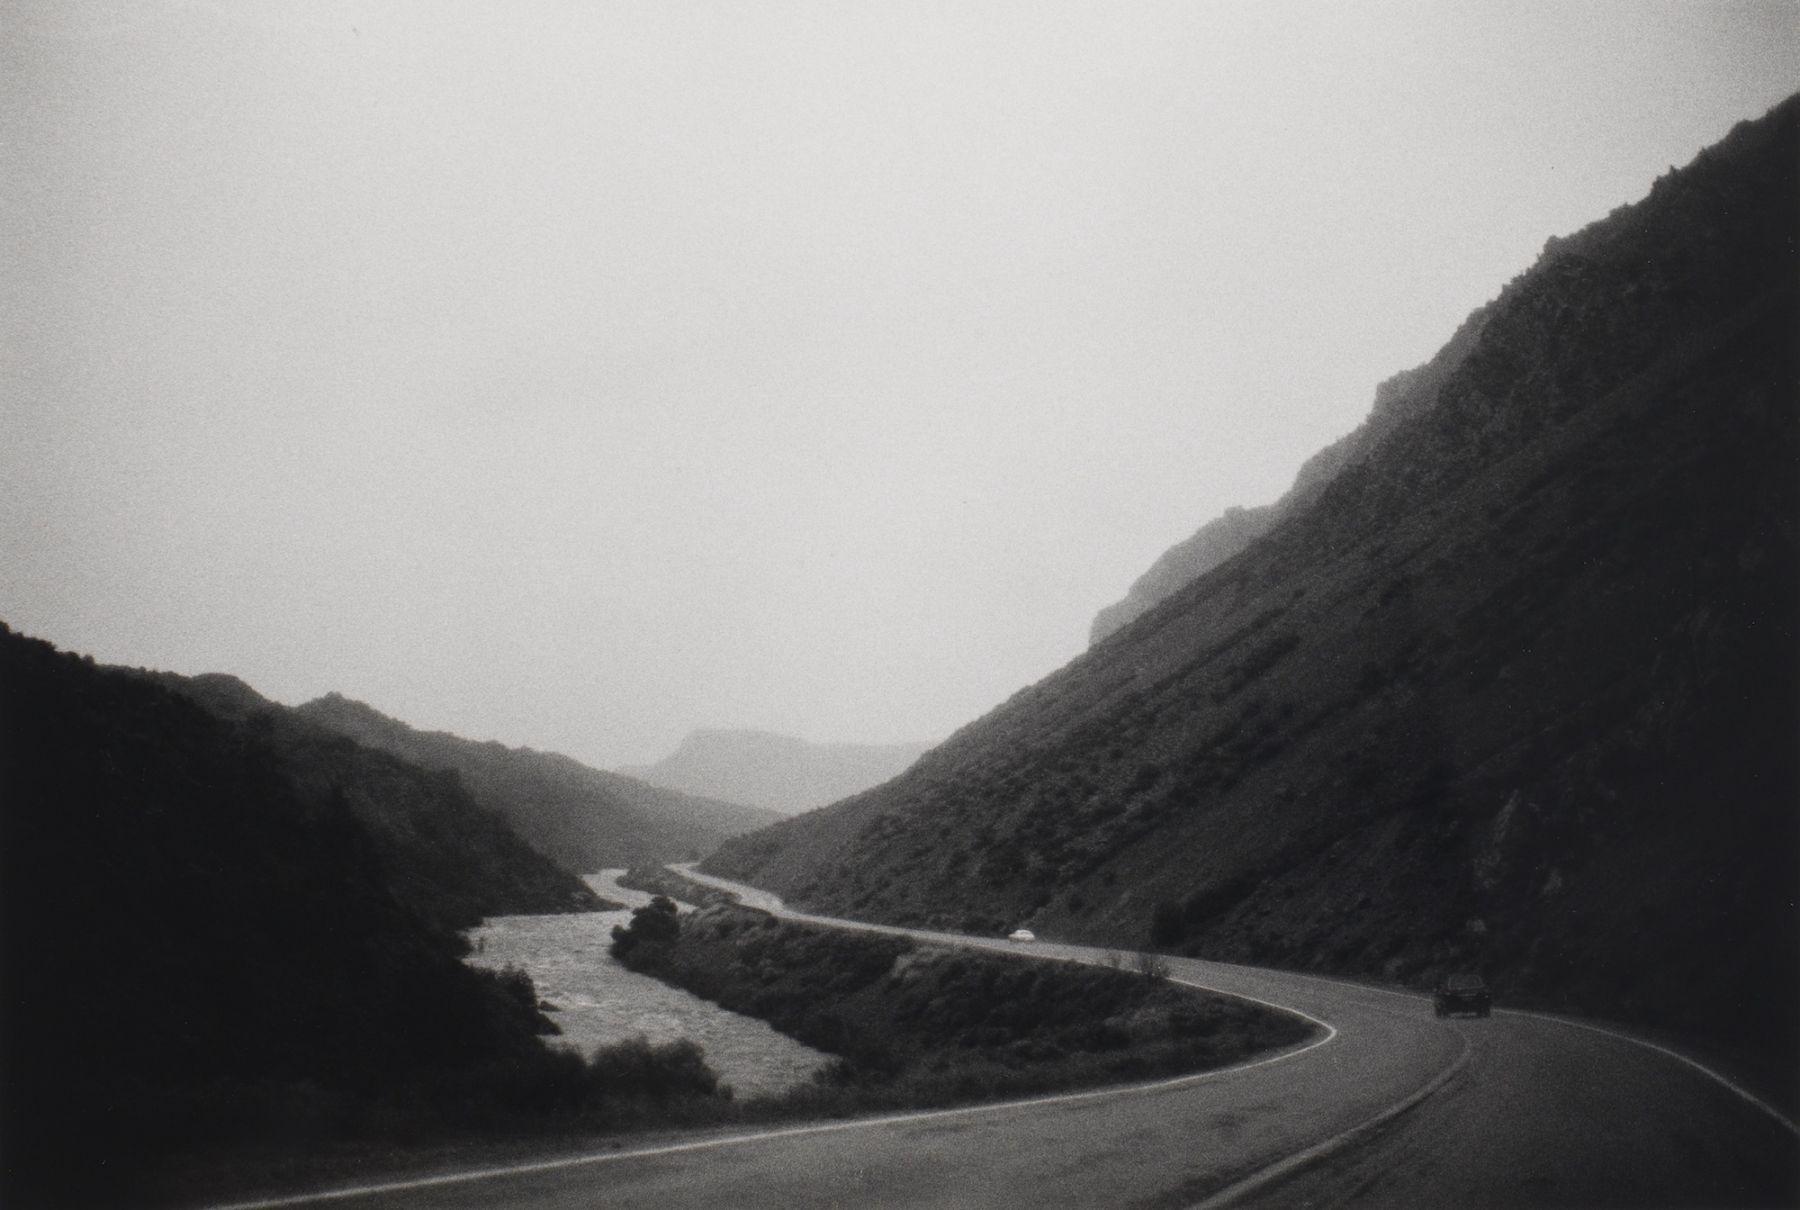 Bernard Plossu (1945-)  The Rio Grande near Taos, 1979  Gelatin silver print  10 x 14 inches (paper), black and white photography